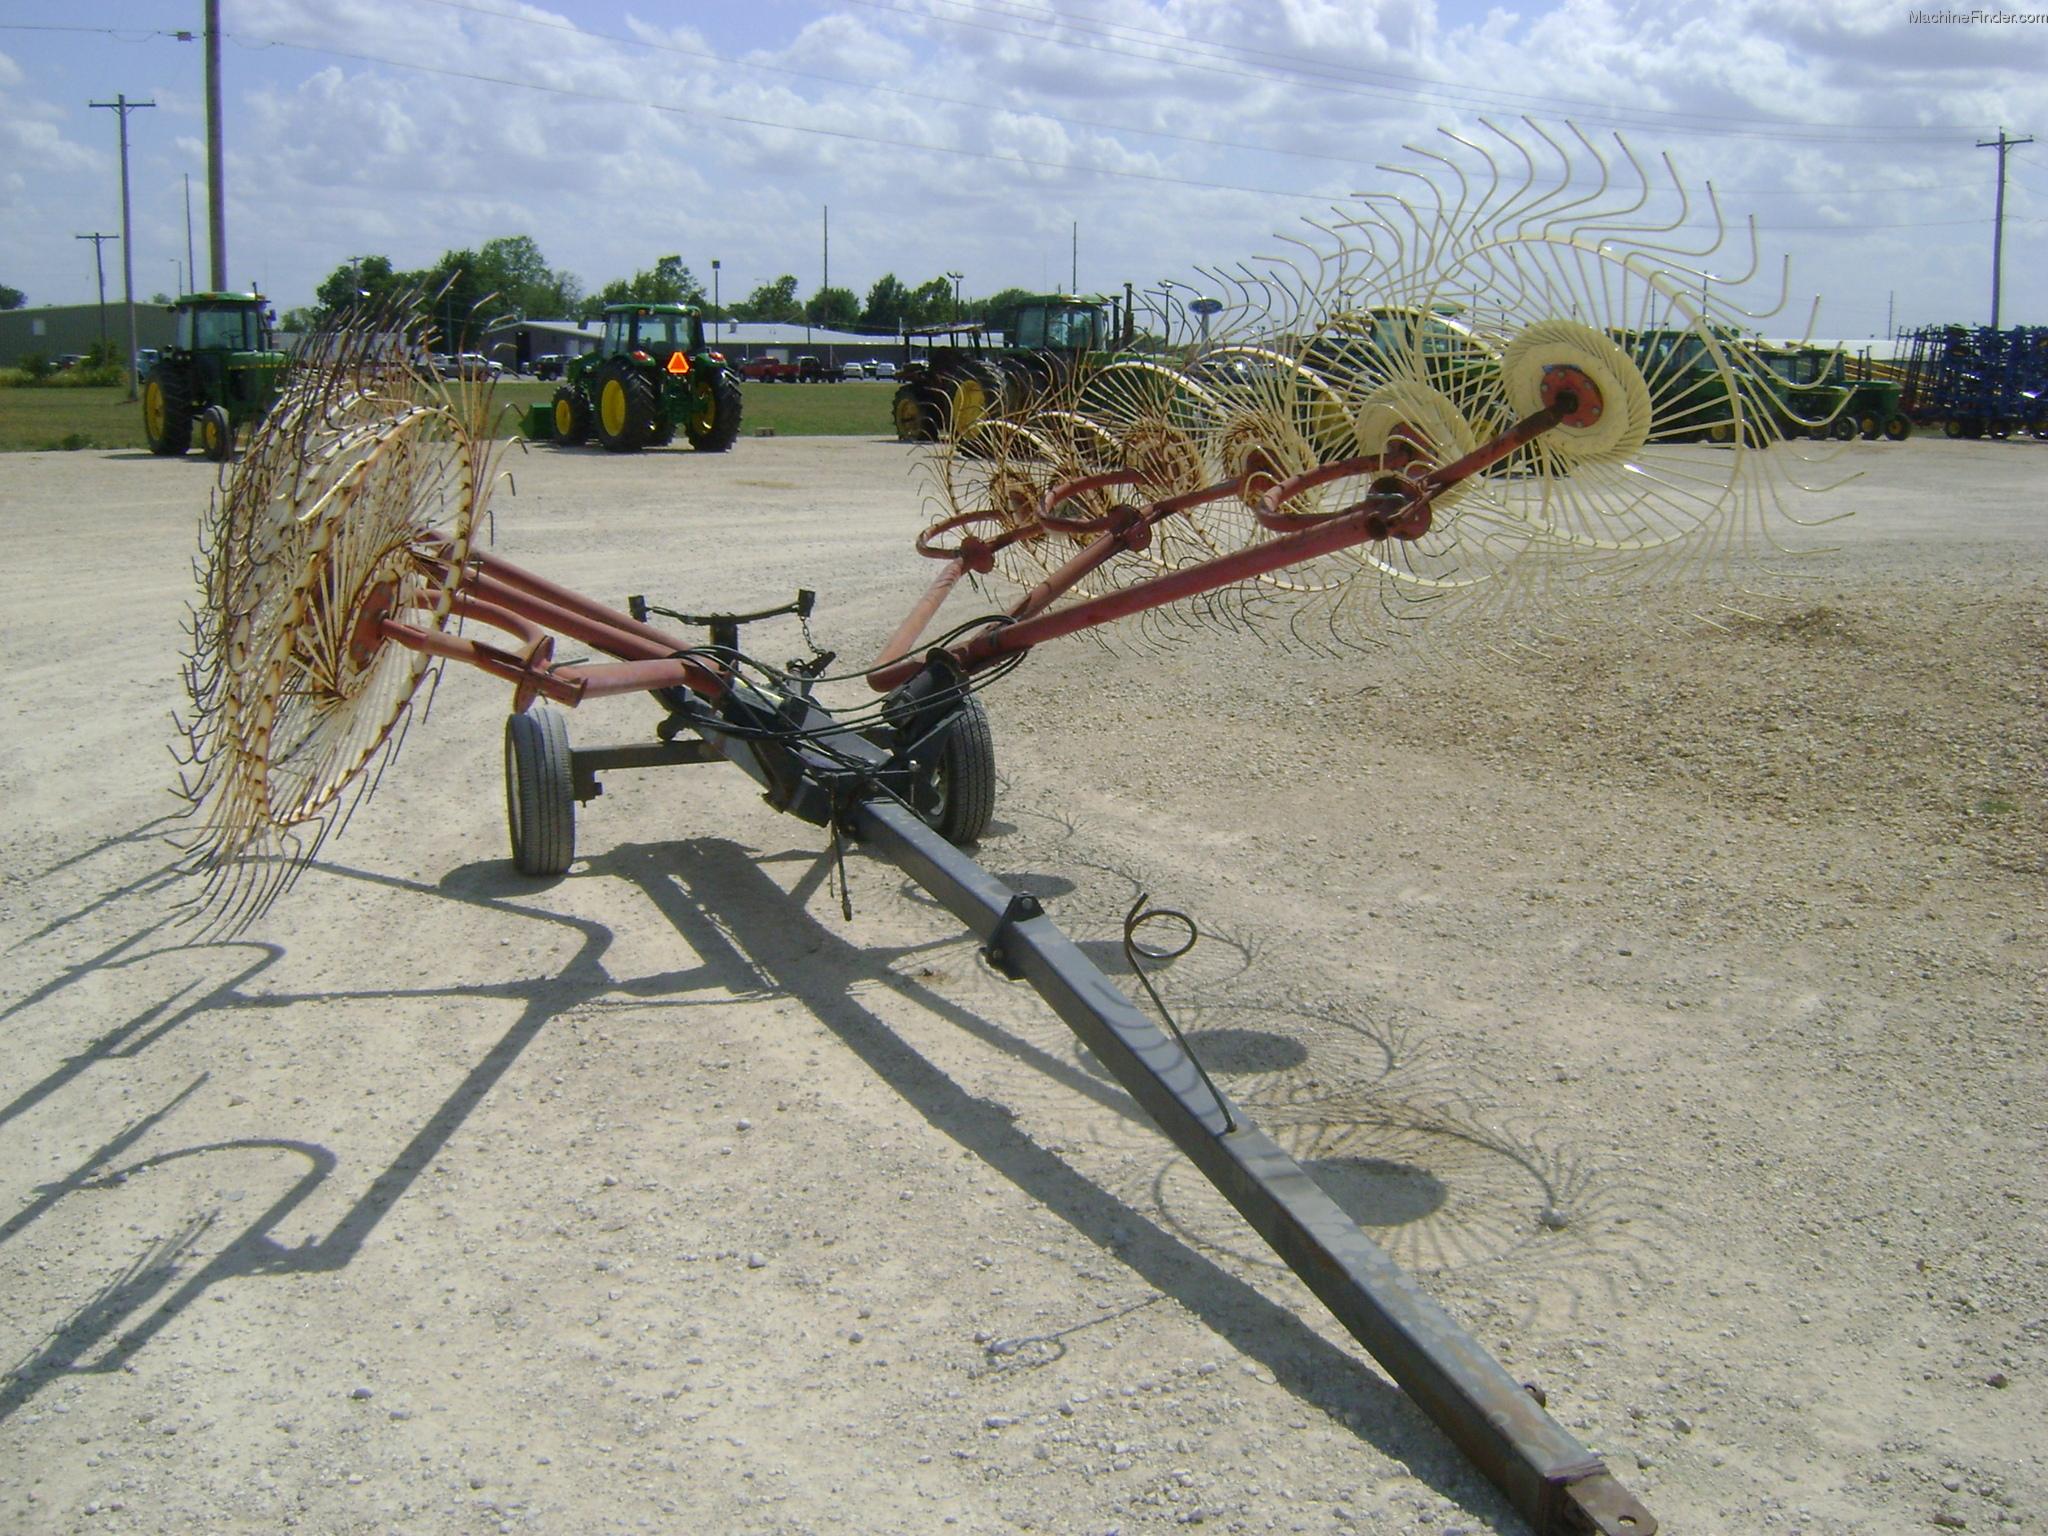 Sitrex Rake Parts : Sitrex hay equipment handling and transport john